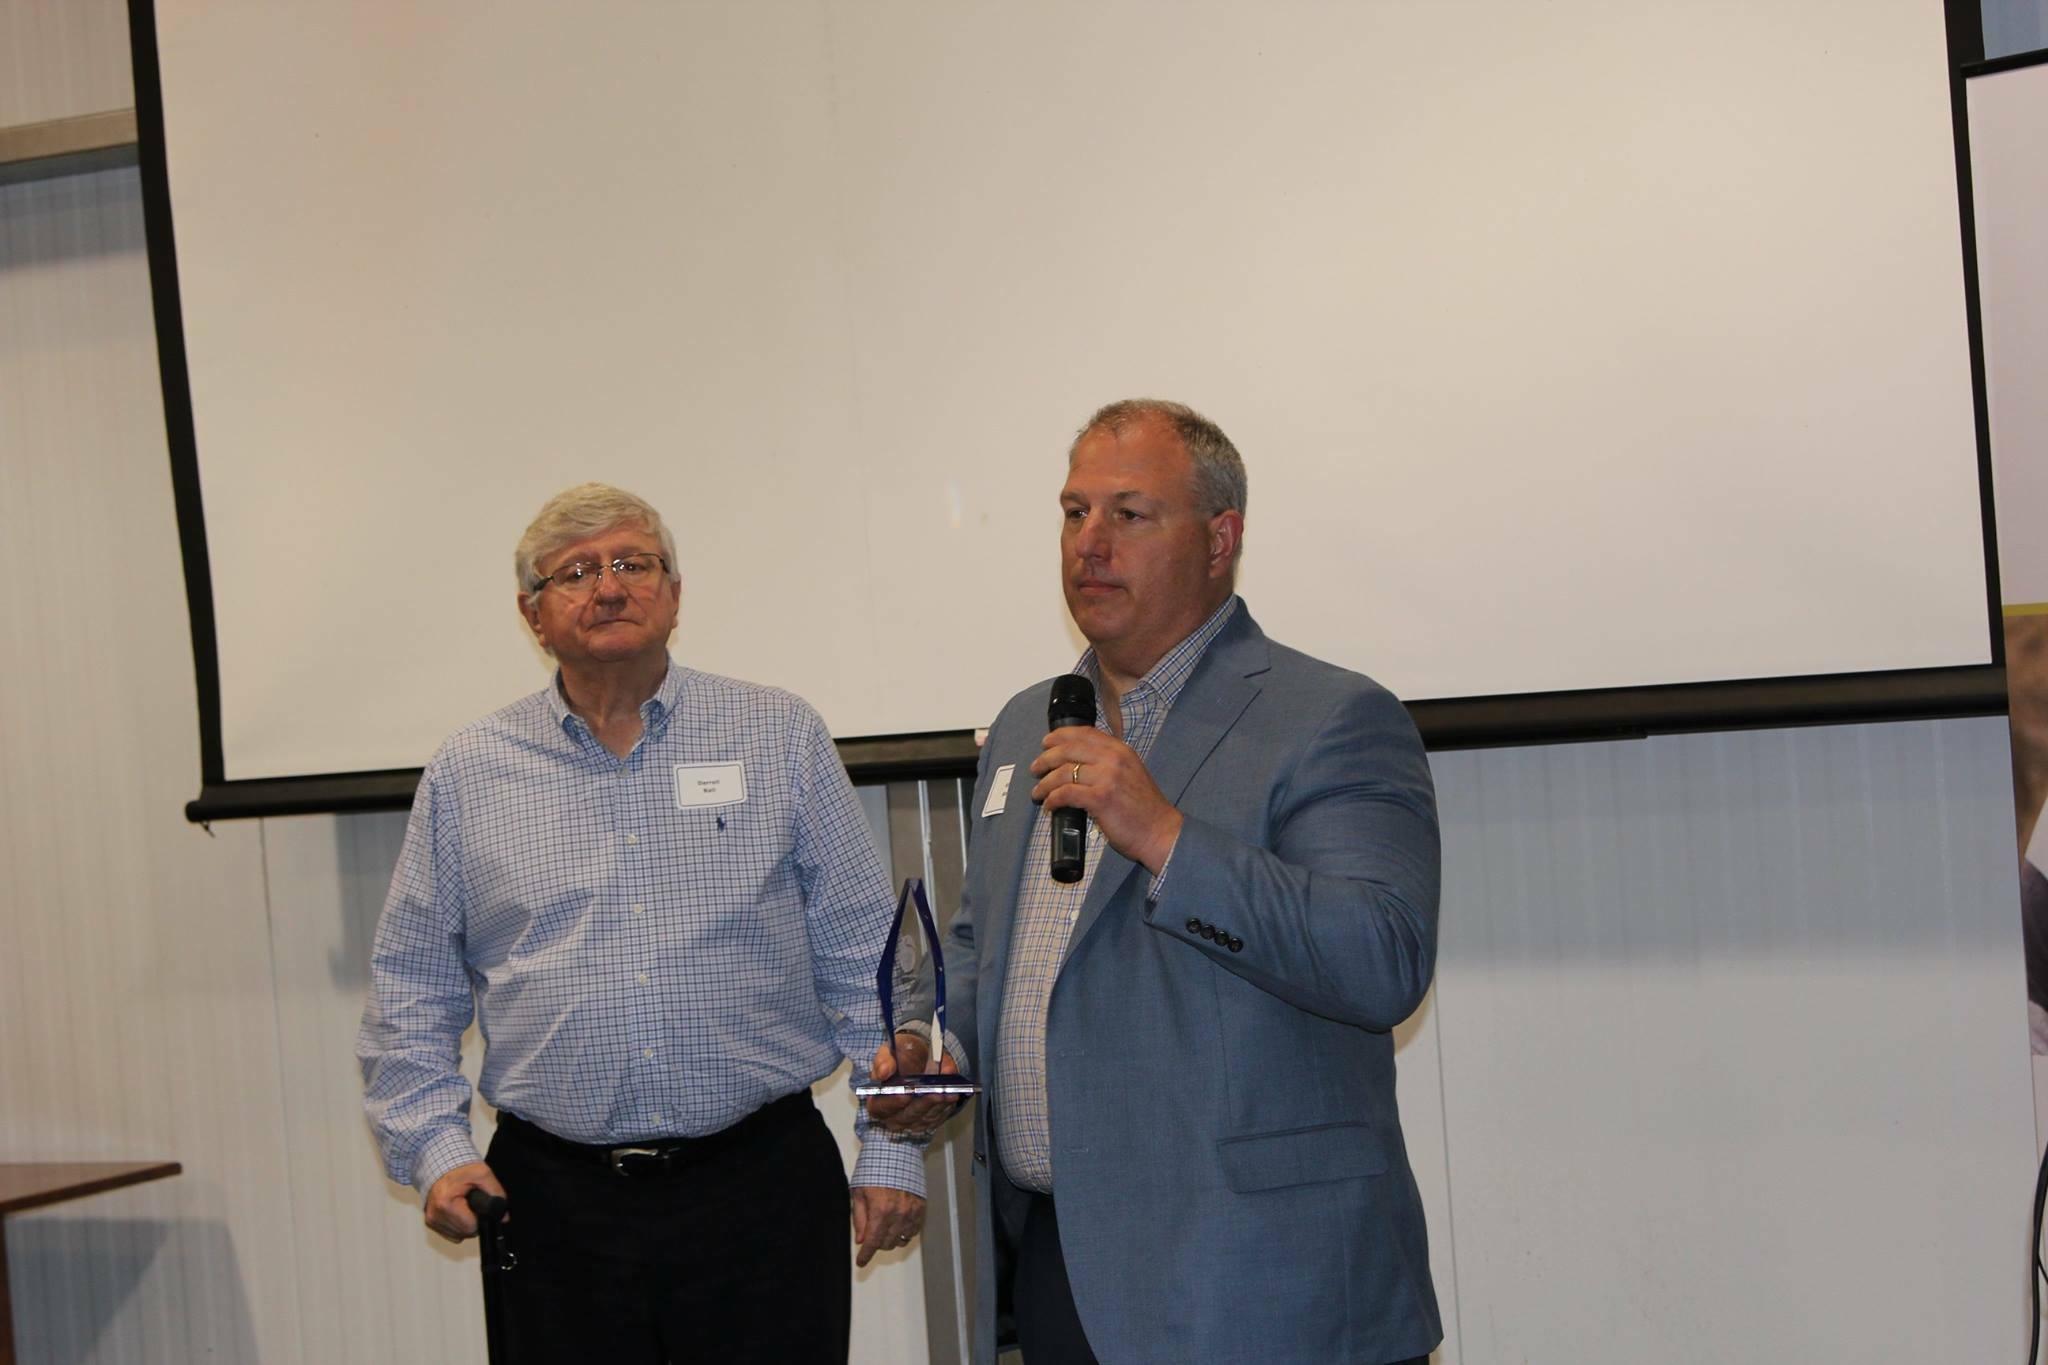 Rick Ball and Family Receive Youth Homes Award